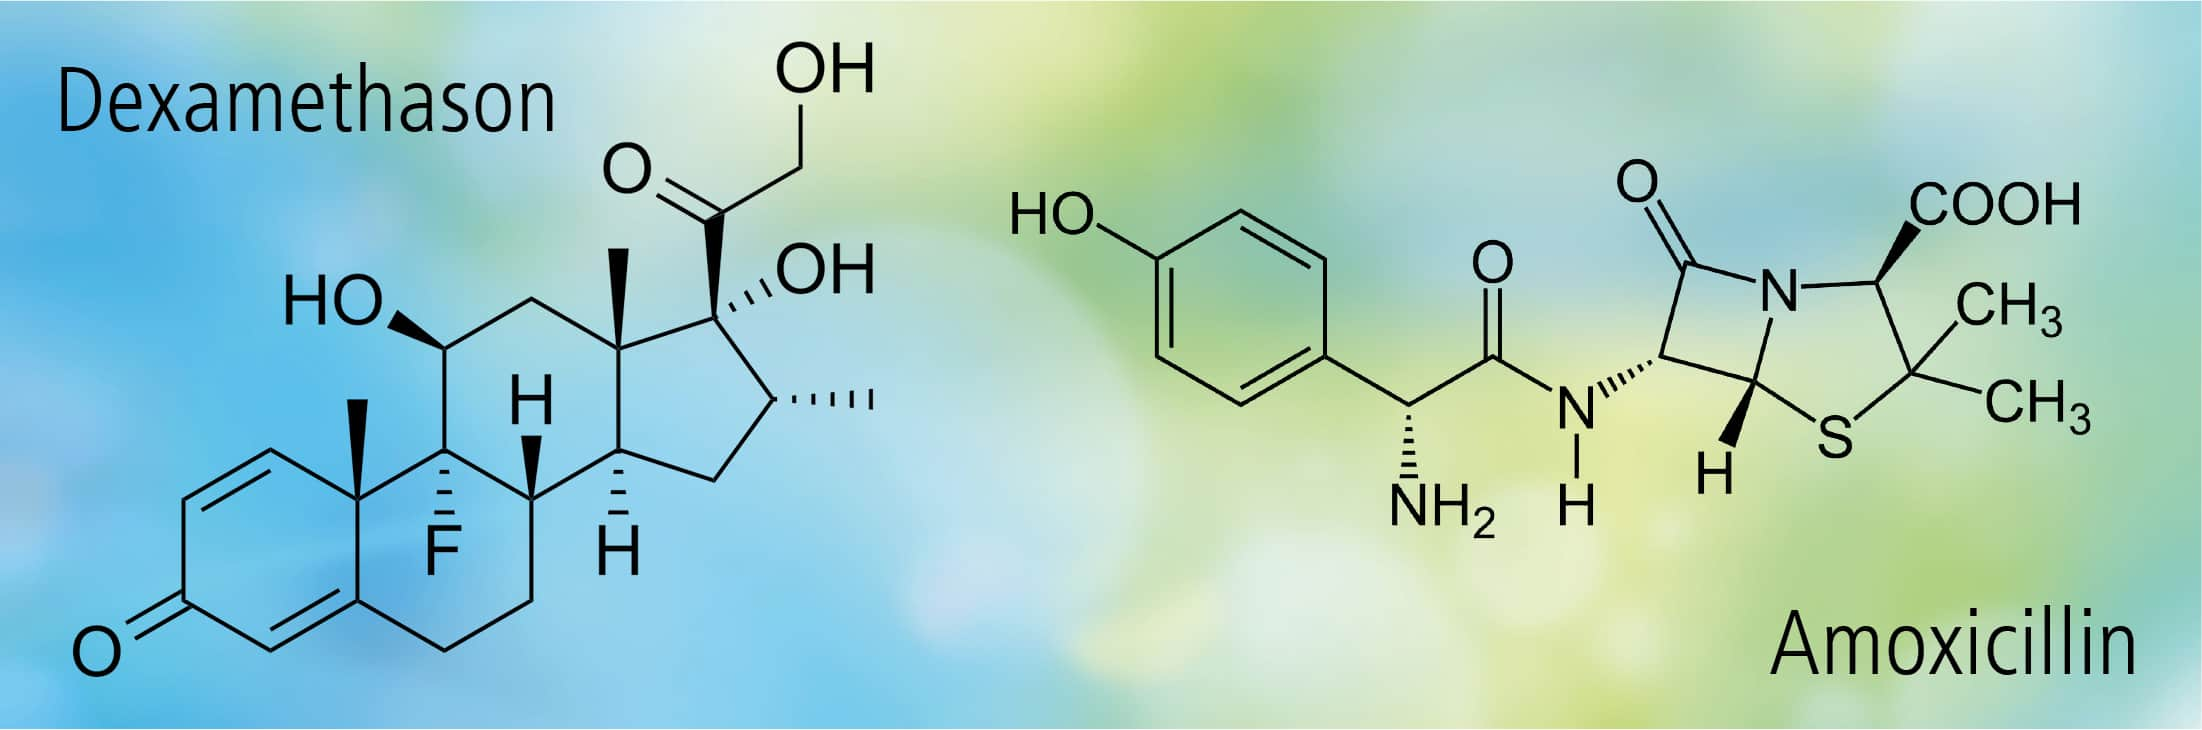 Chemische Struktur Dexamethason Amoxicillin denecke zahnmedizin